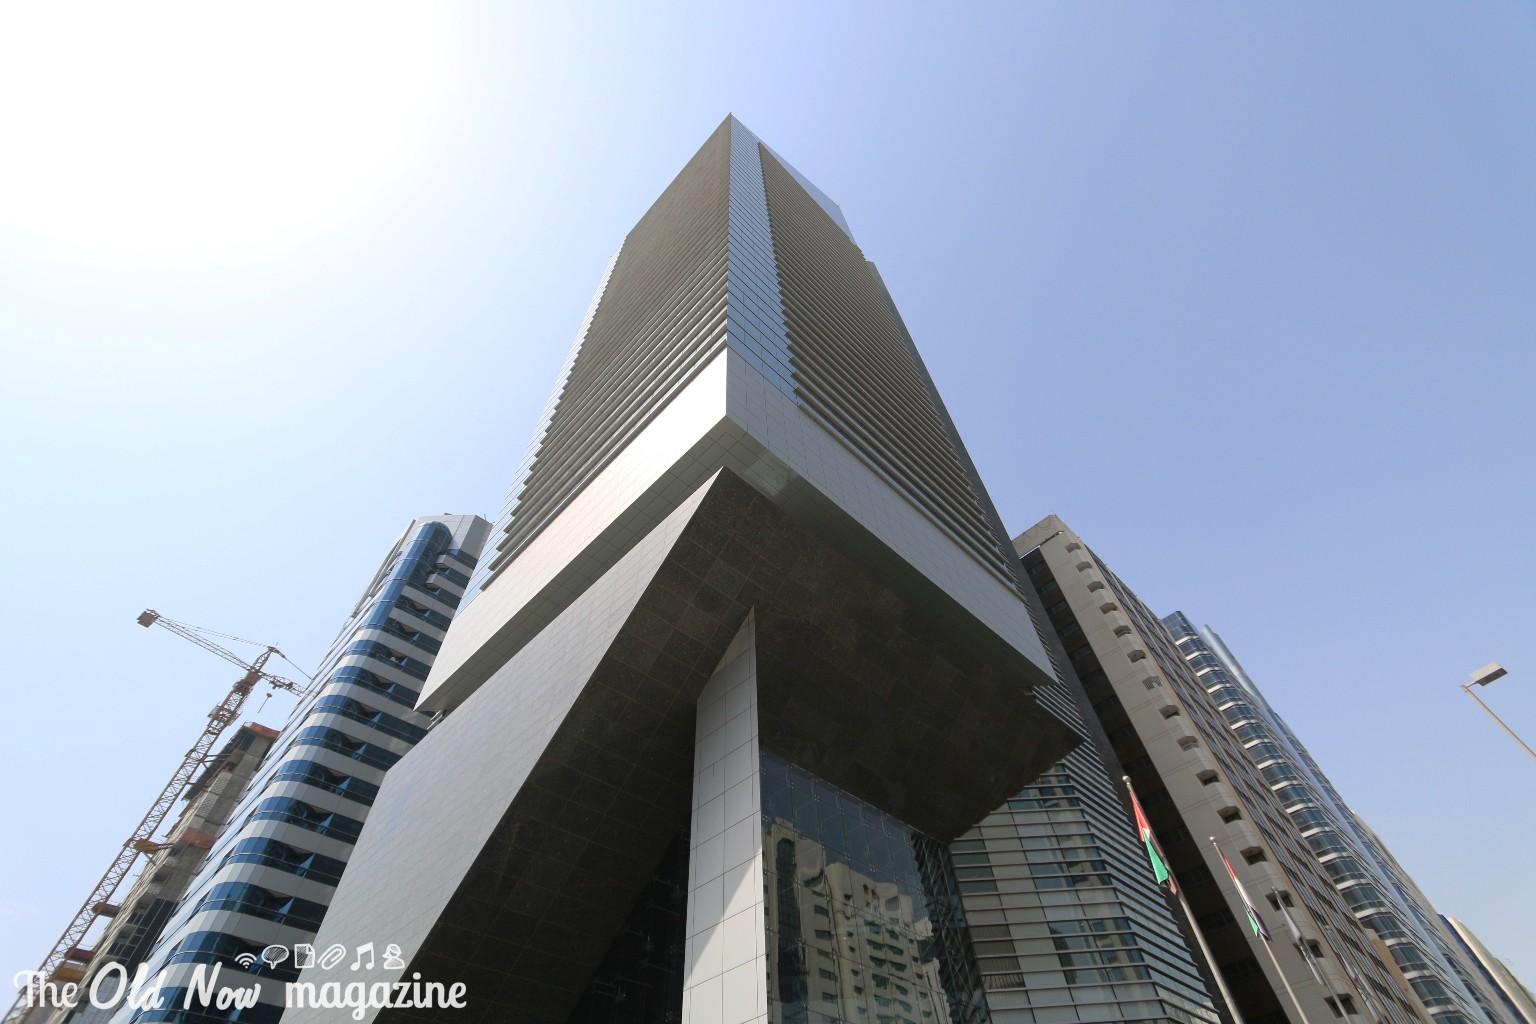 Abu Dhabi THEOLDNOW DAY 1 (8)